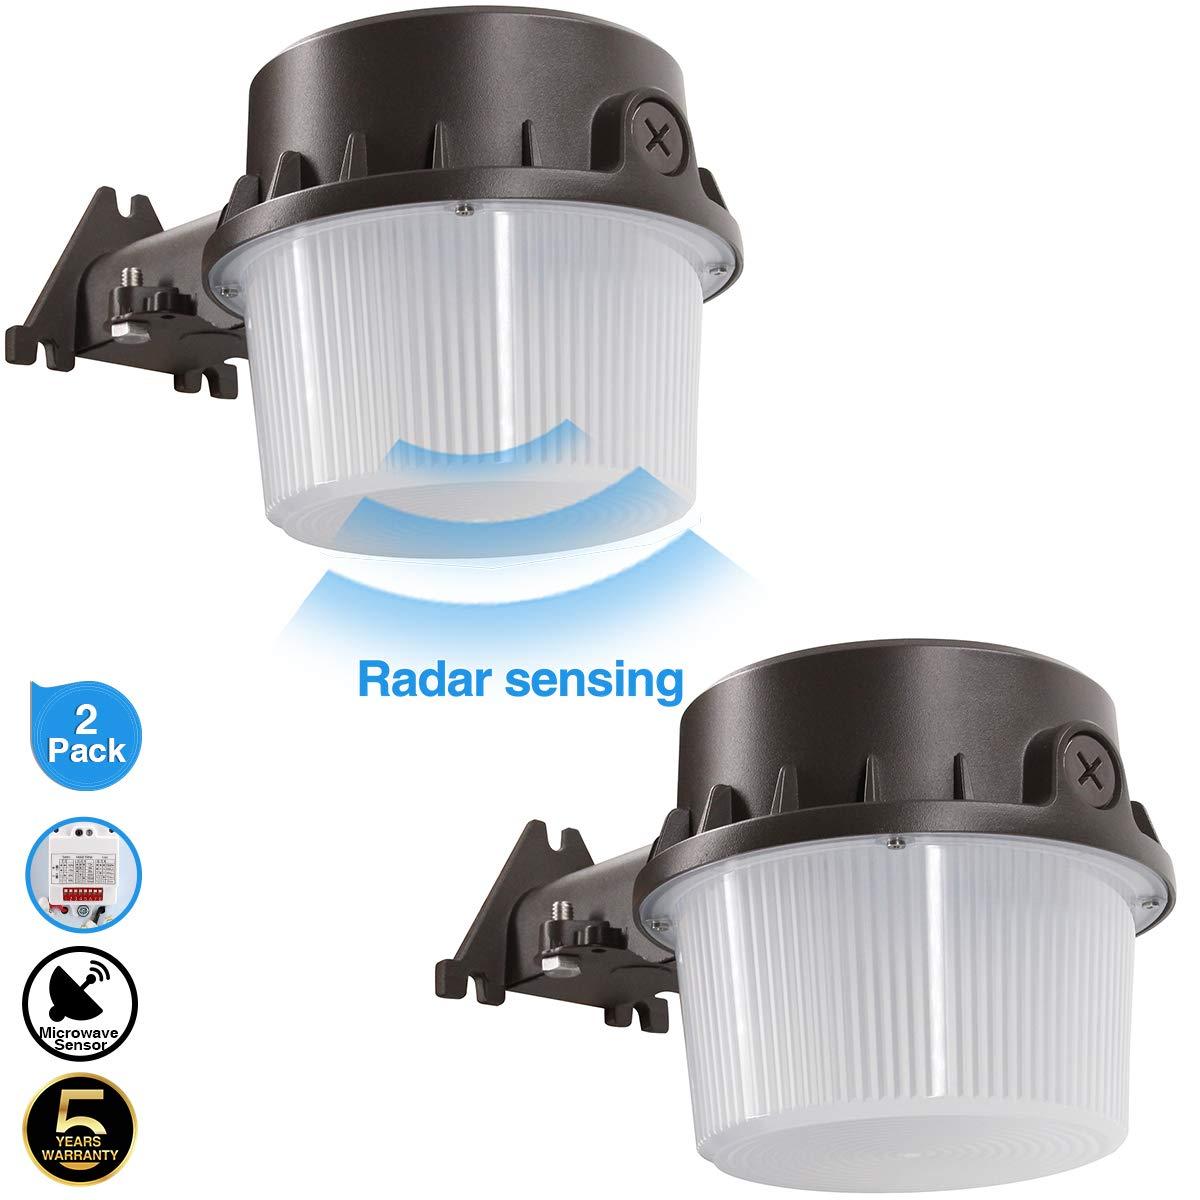 Radar Sense, LED Yard Light for Area Lighting LED Outdoor Barn Light, (250-350W Equivalent), 5000K Daylight, 4200lm Floodlight, Wet Location, Radar Sensor Included, 50K 2Pack by ZJOJO